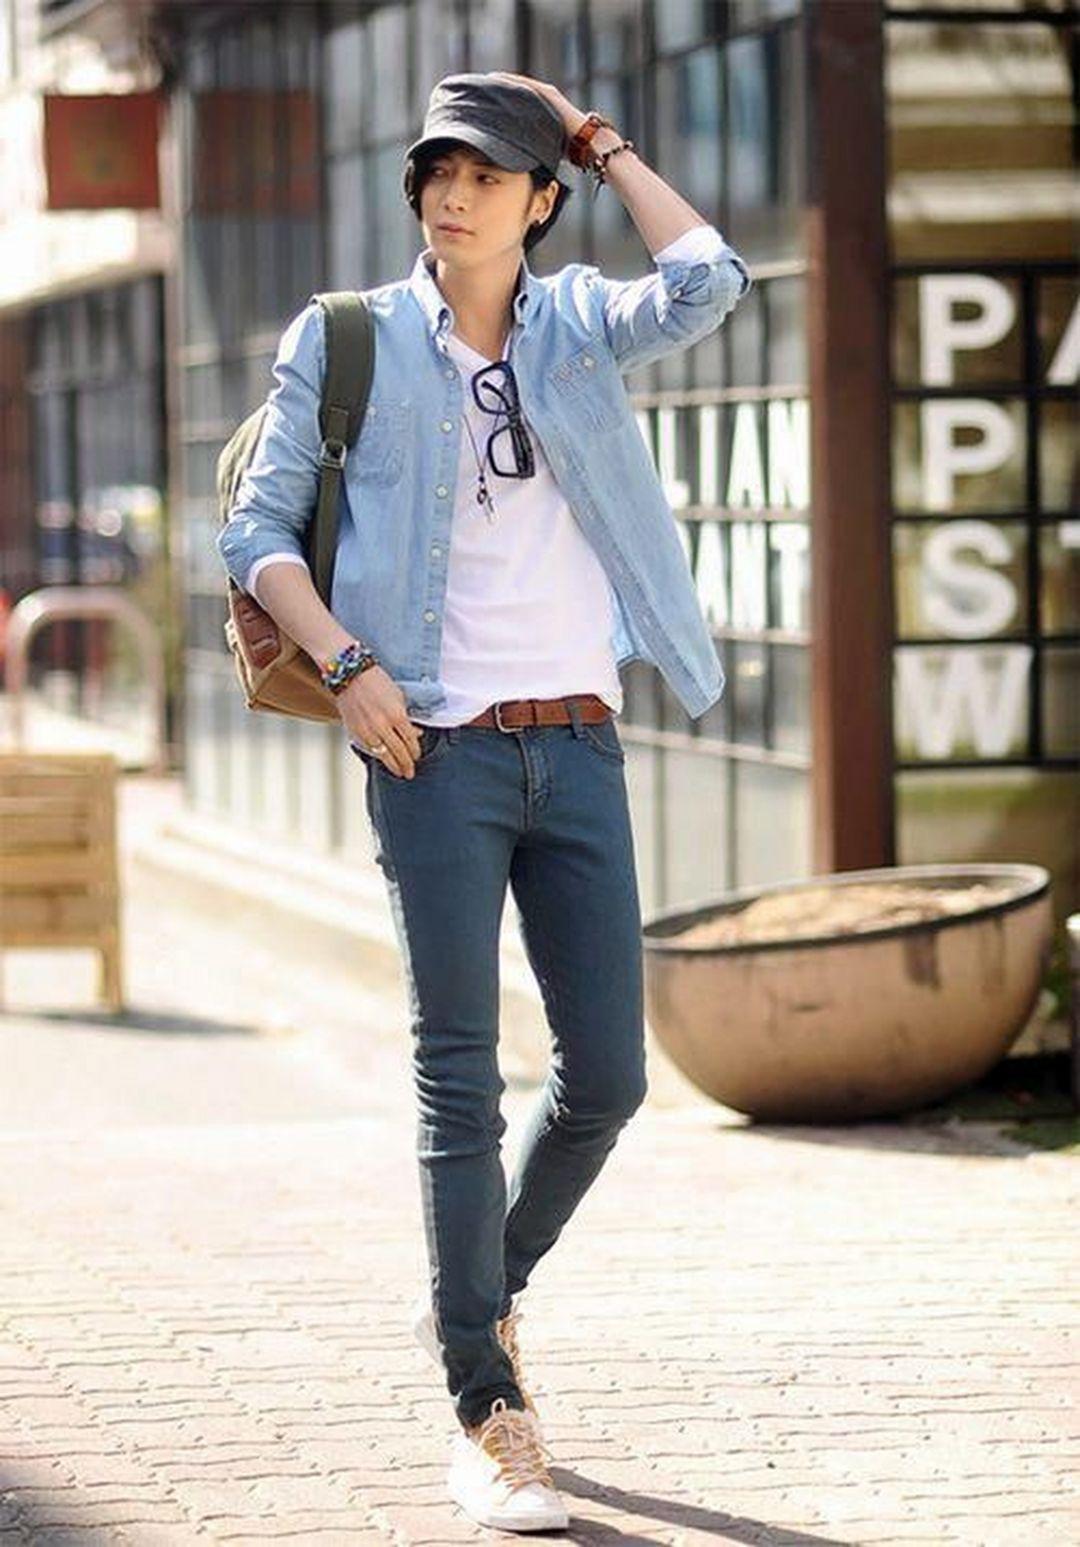 13 Cool Summer Mens Street Styles Ideas Men Ssummeroutfits Mensfashionideas Summermensstr Asian Men Fashion Korean Street Fashion Korean Fashion Men [ 1547 x 1080 Pixel ]